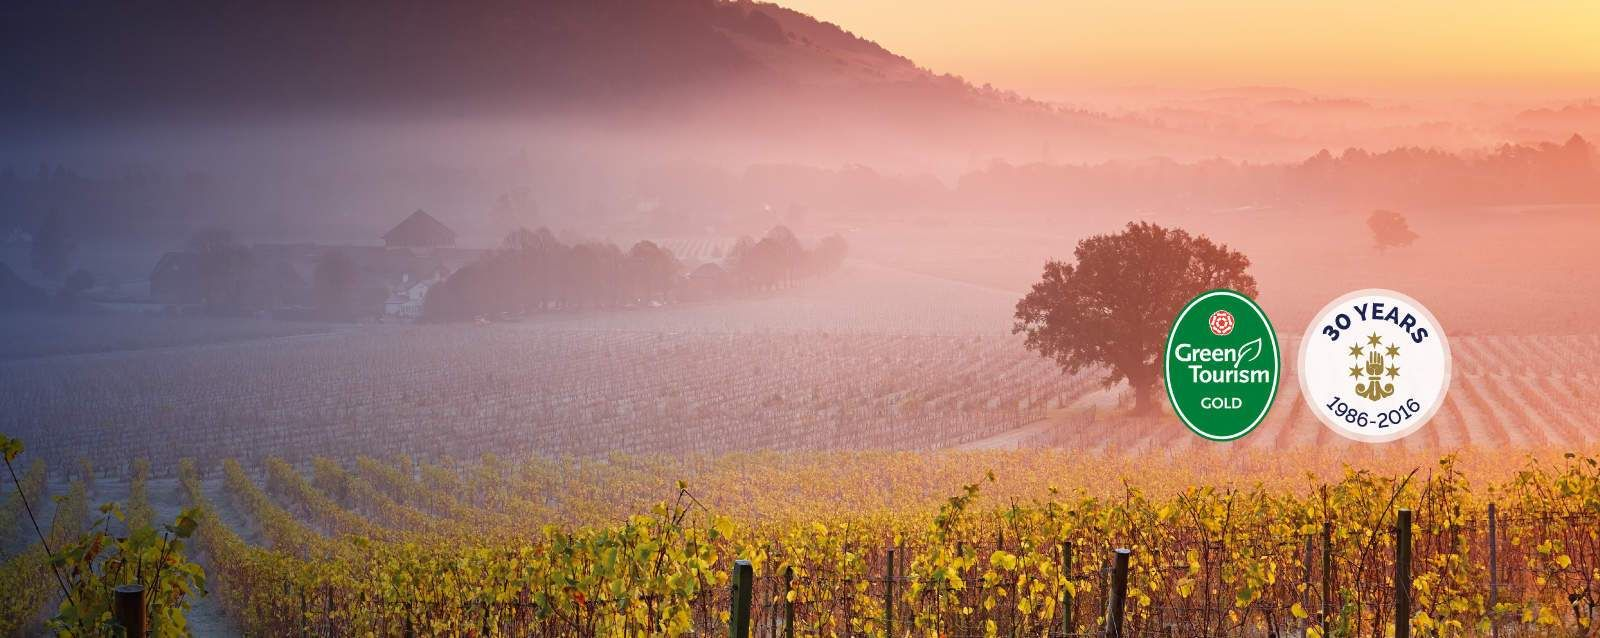 Denbies vineyard in Dorking, Surrey has one of the